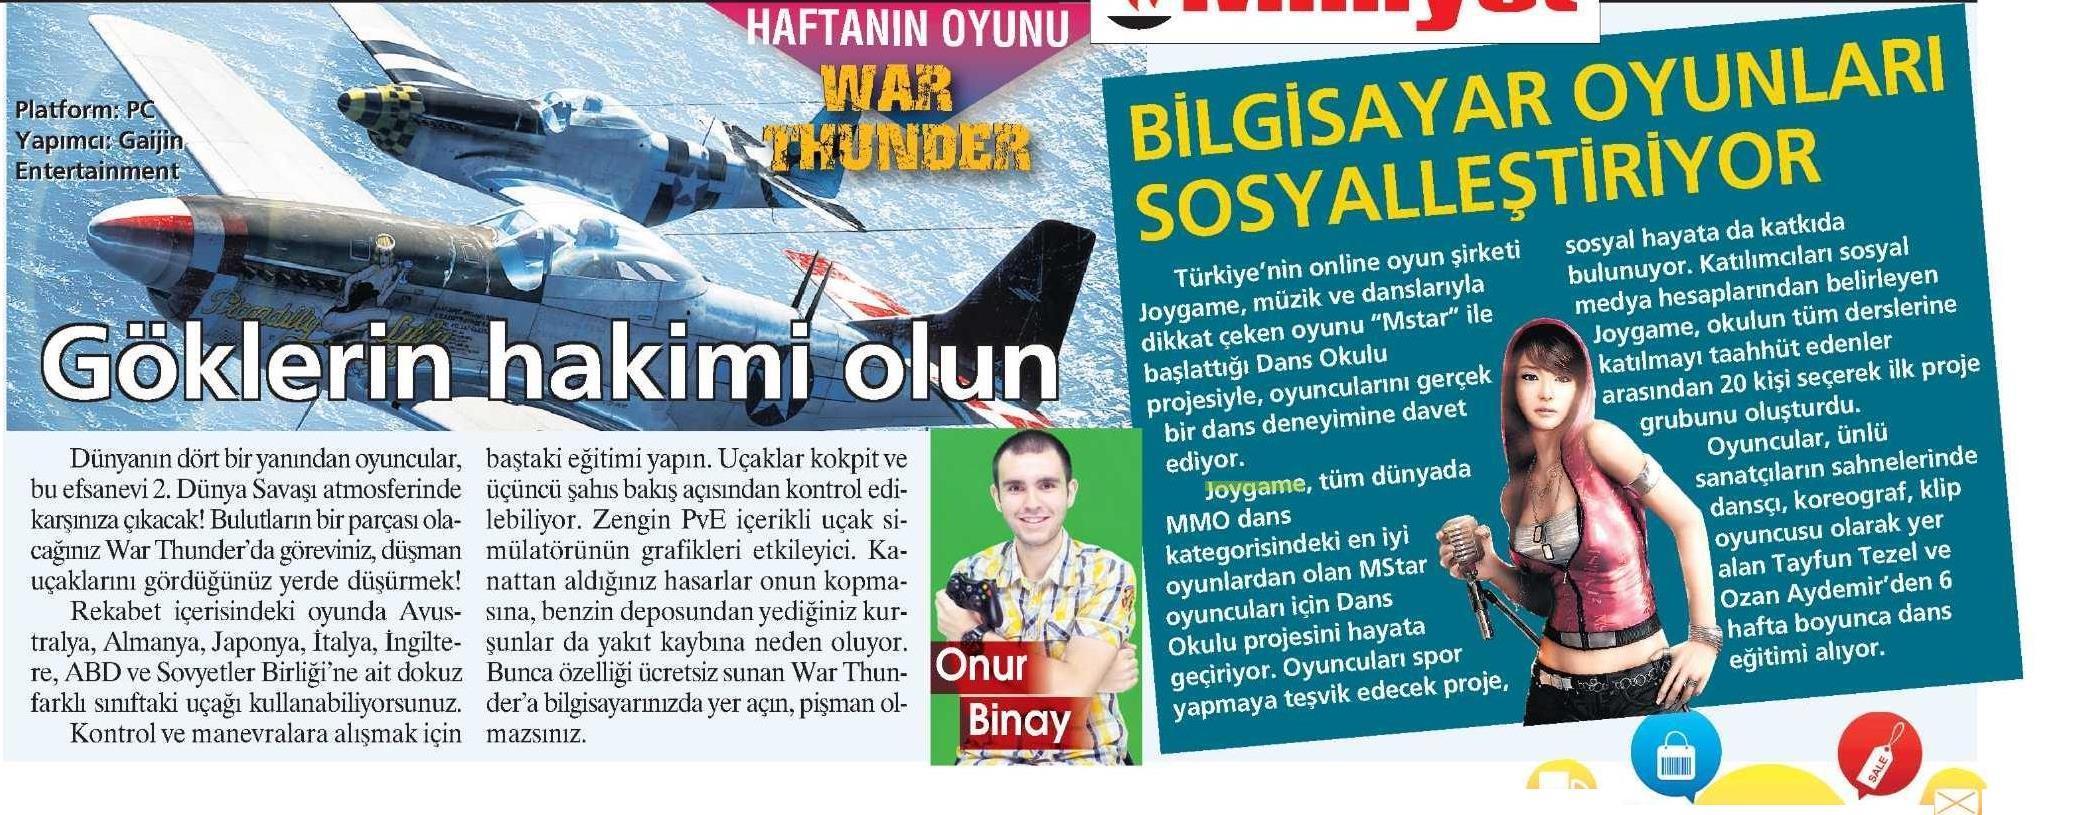 Netmarble-Turkey-Milliyet-Sayfa-16-14-Aralik-2013